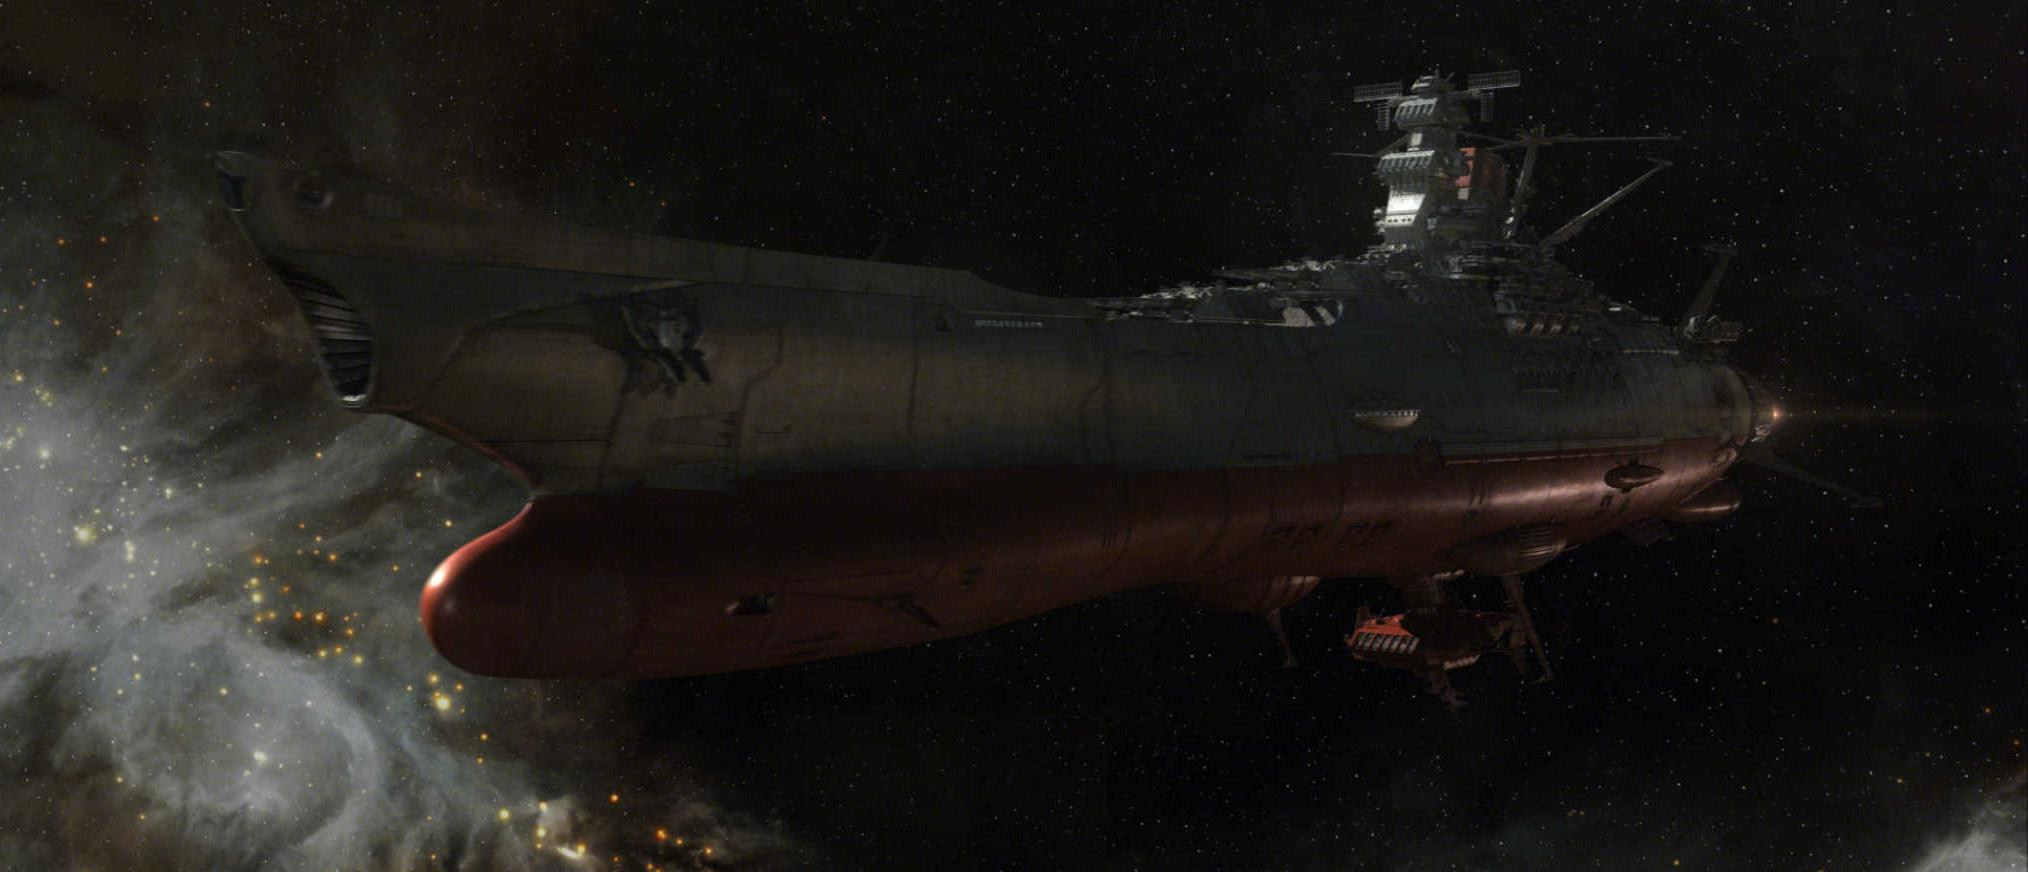 Review space battleship yamato